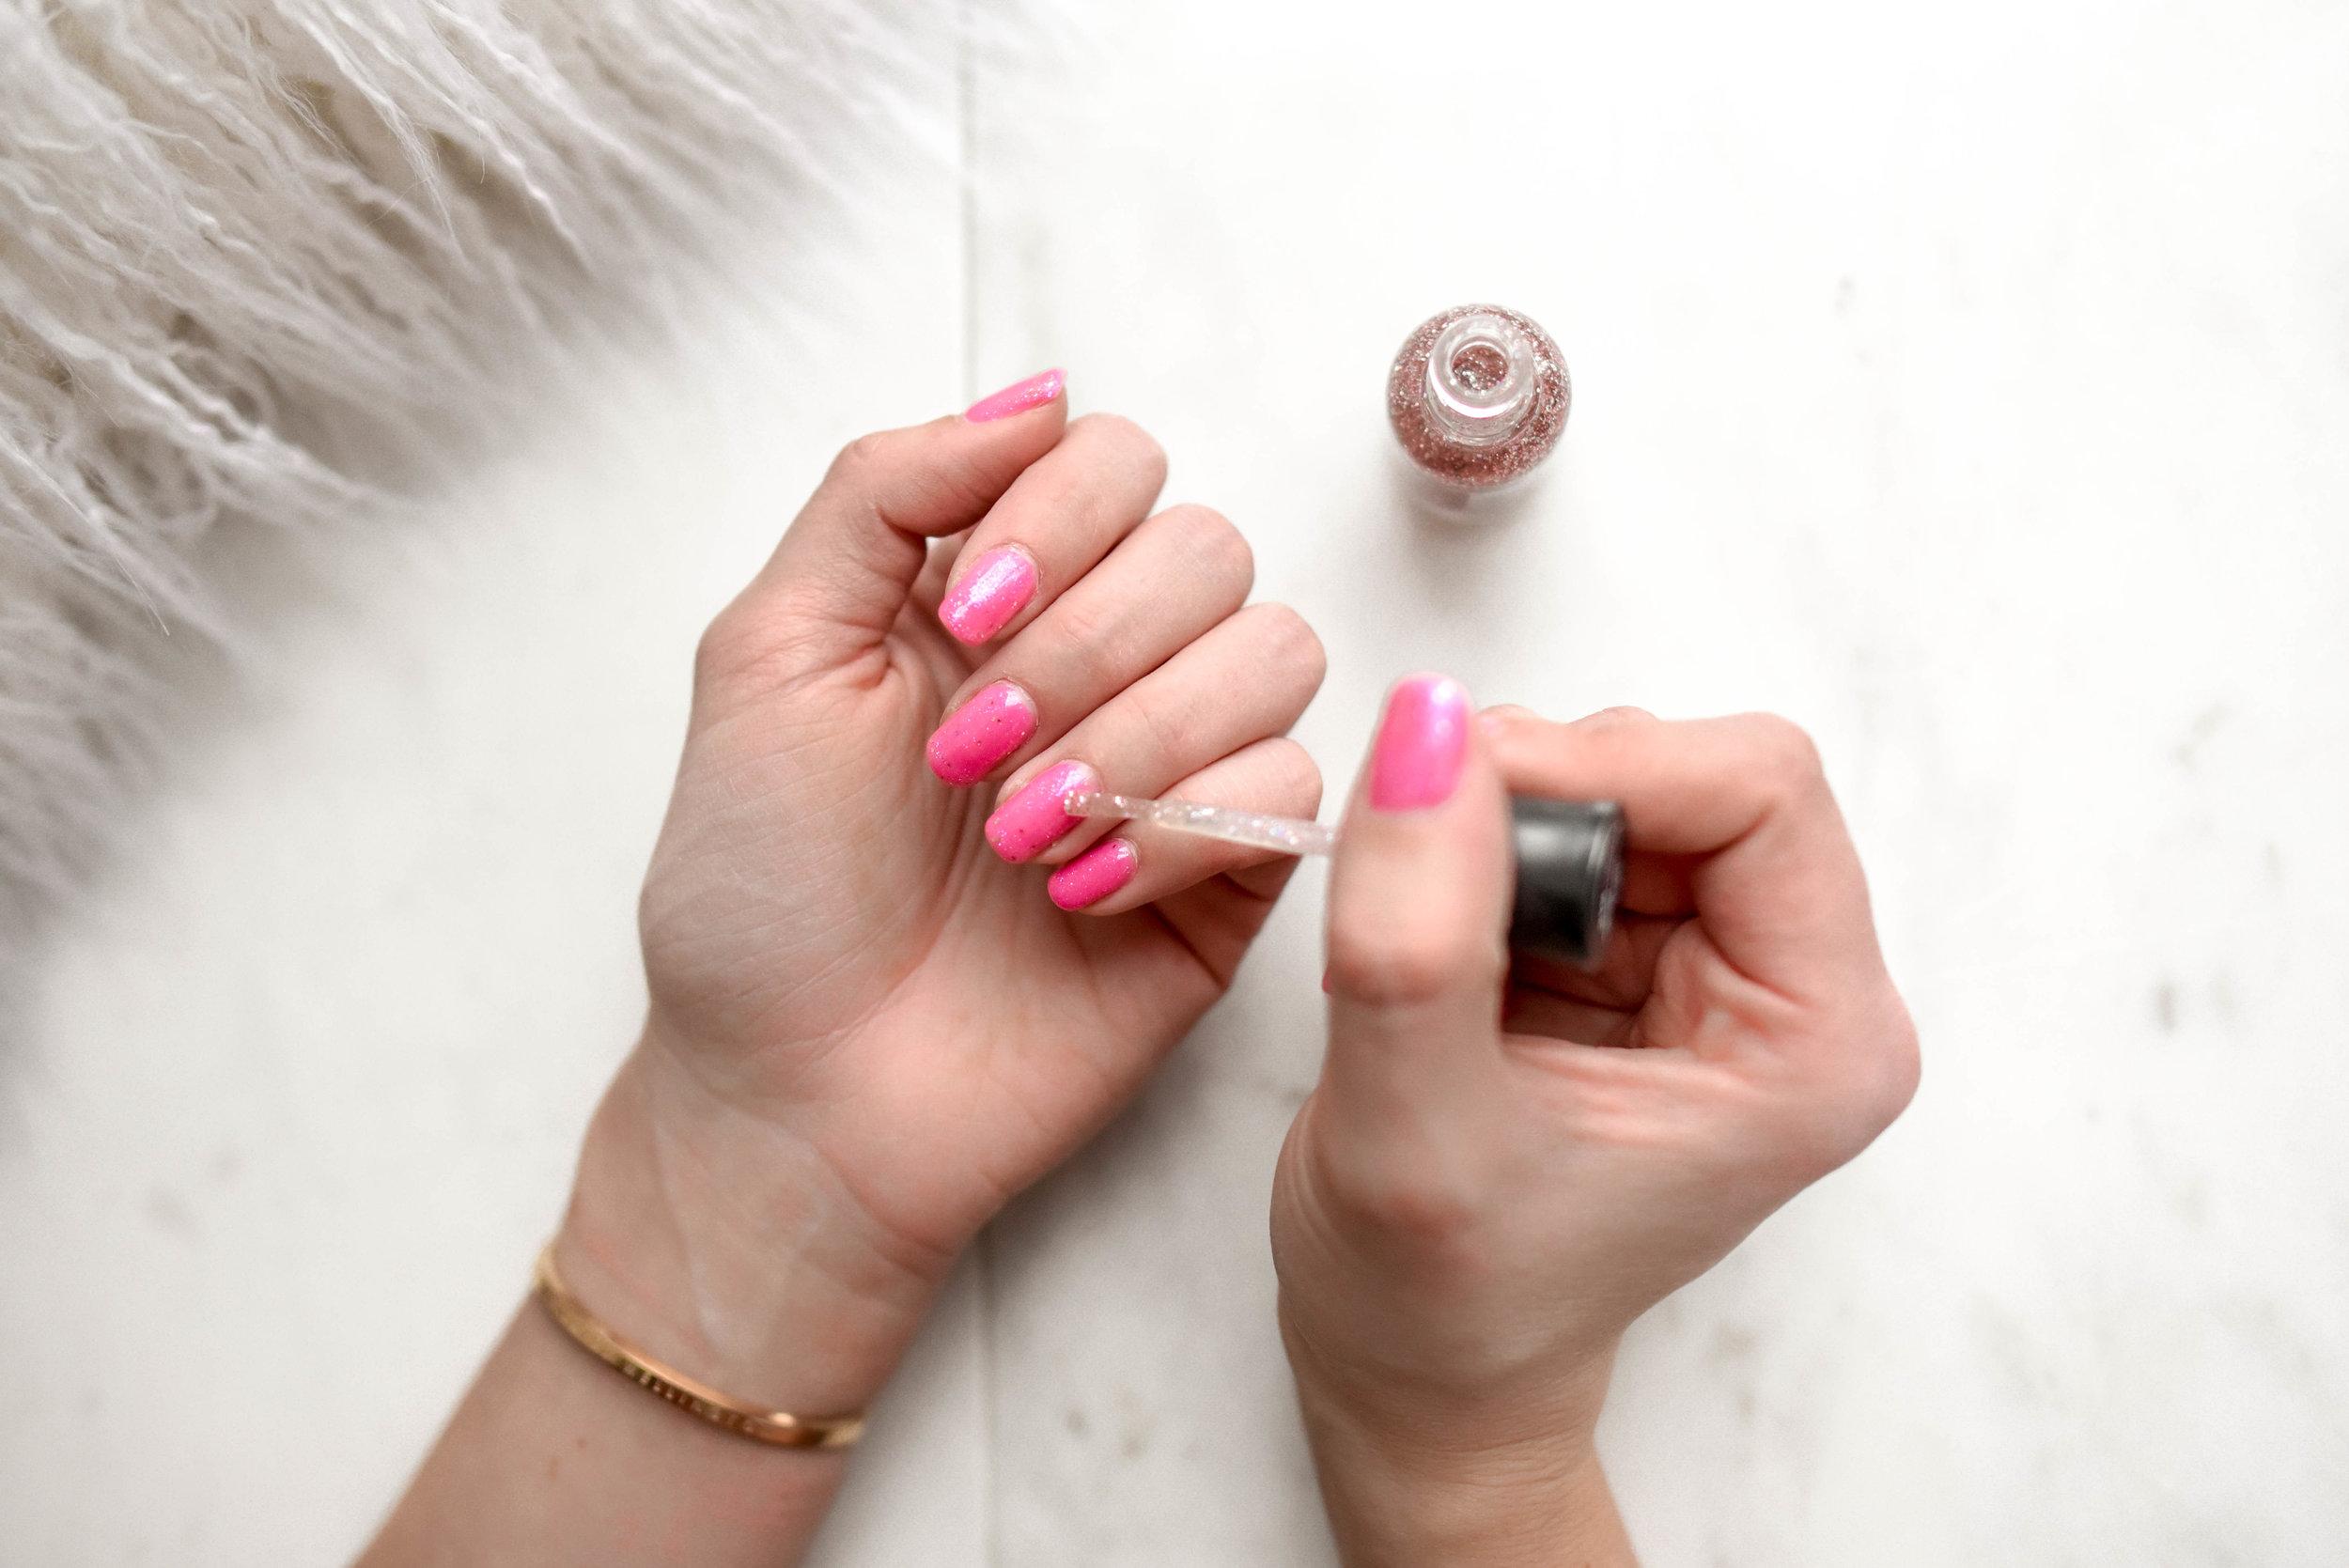 Nails - Manicure: 9-15 creditsGel Manicure: 18-21 creditsPedicure: 18 credits